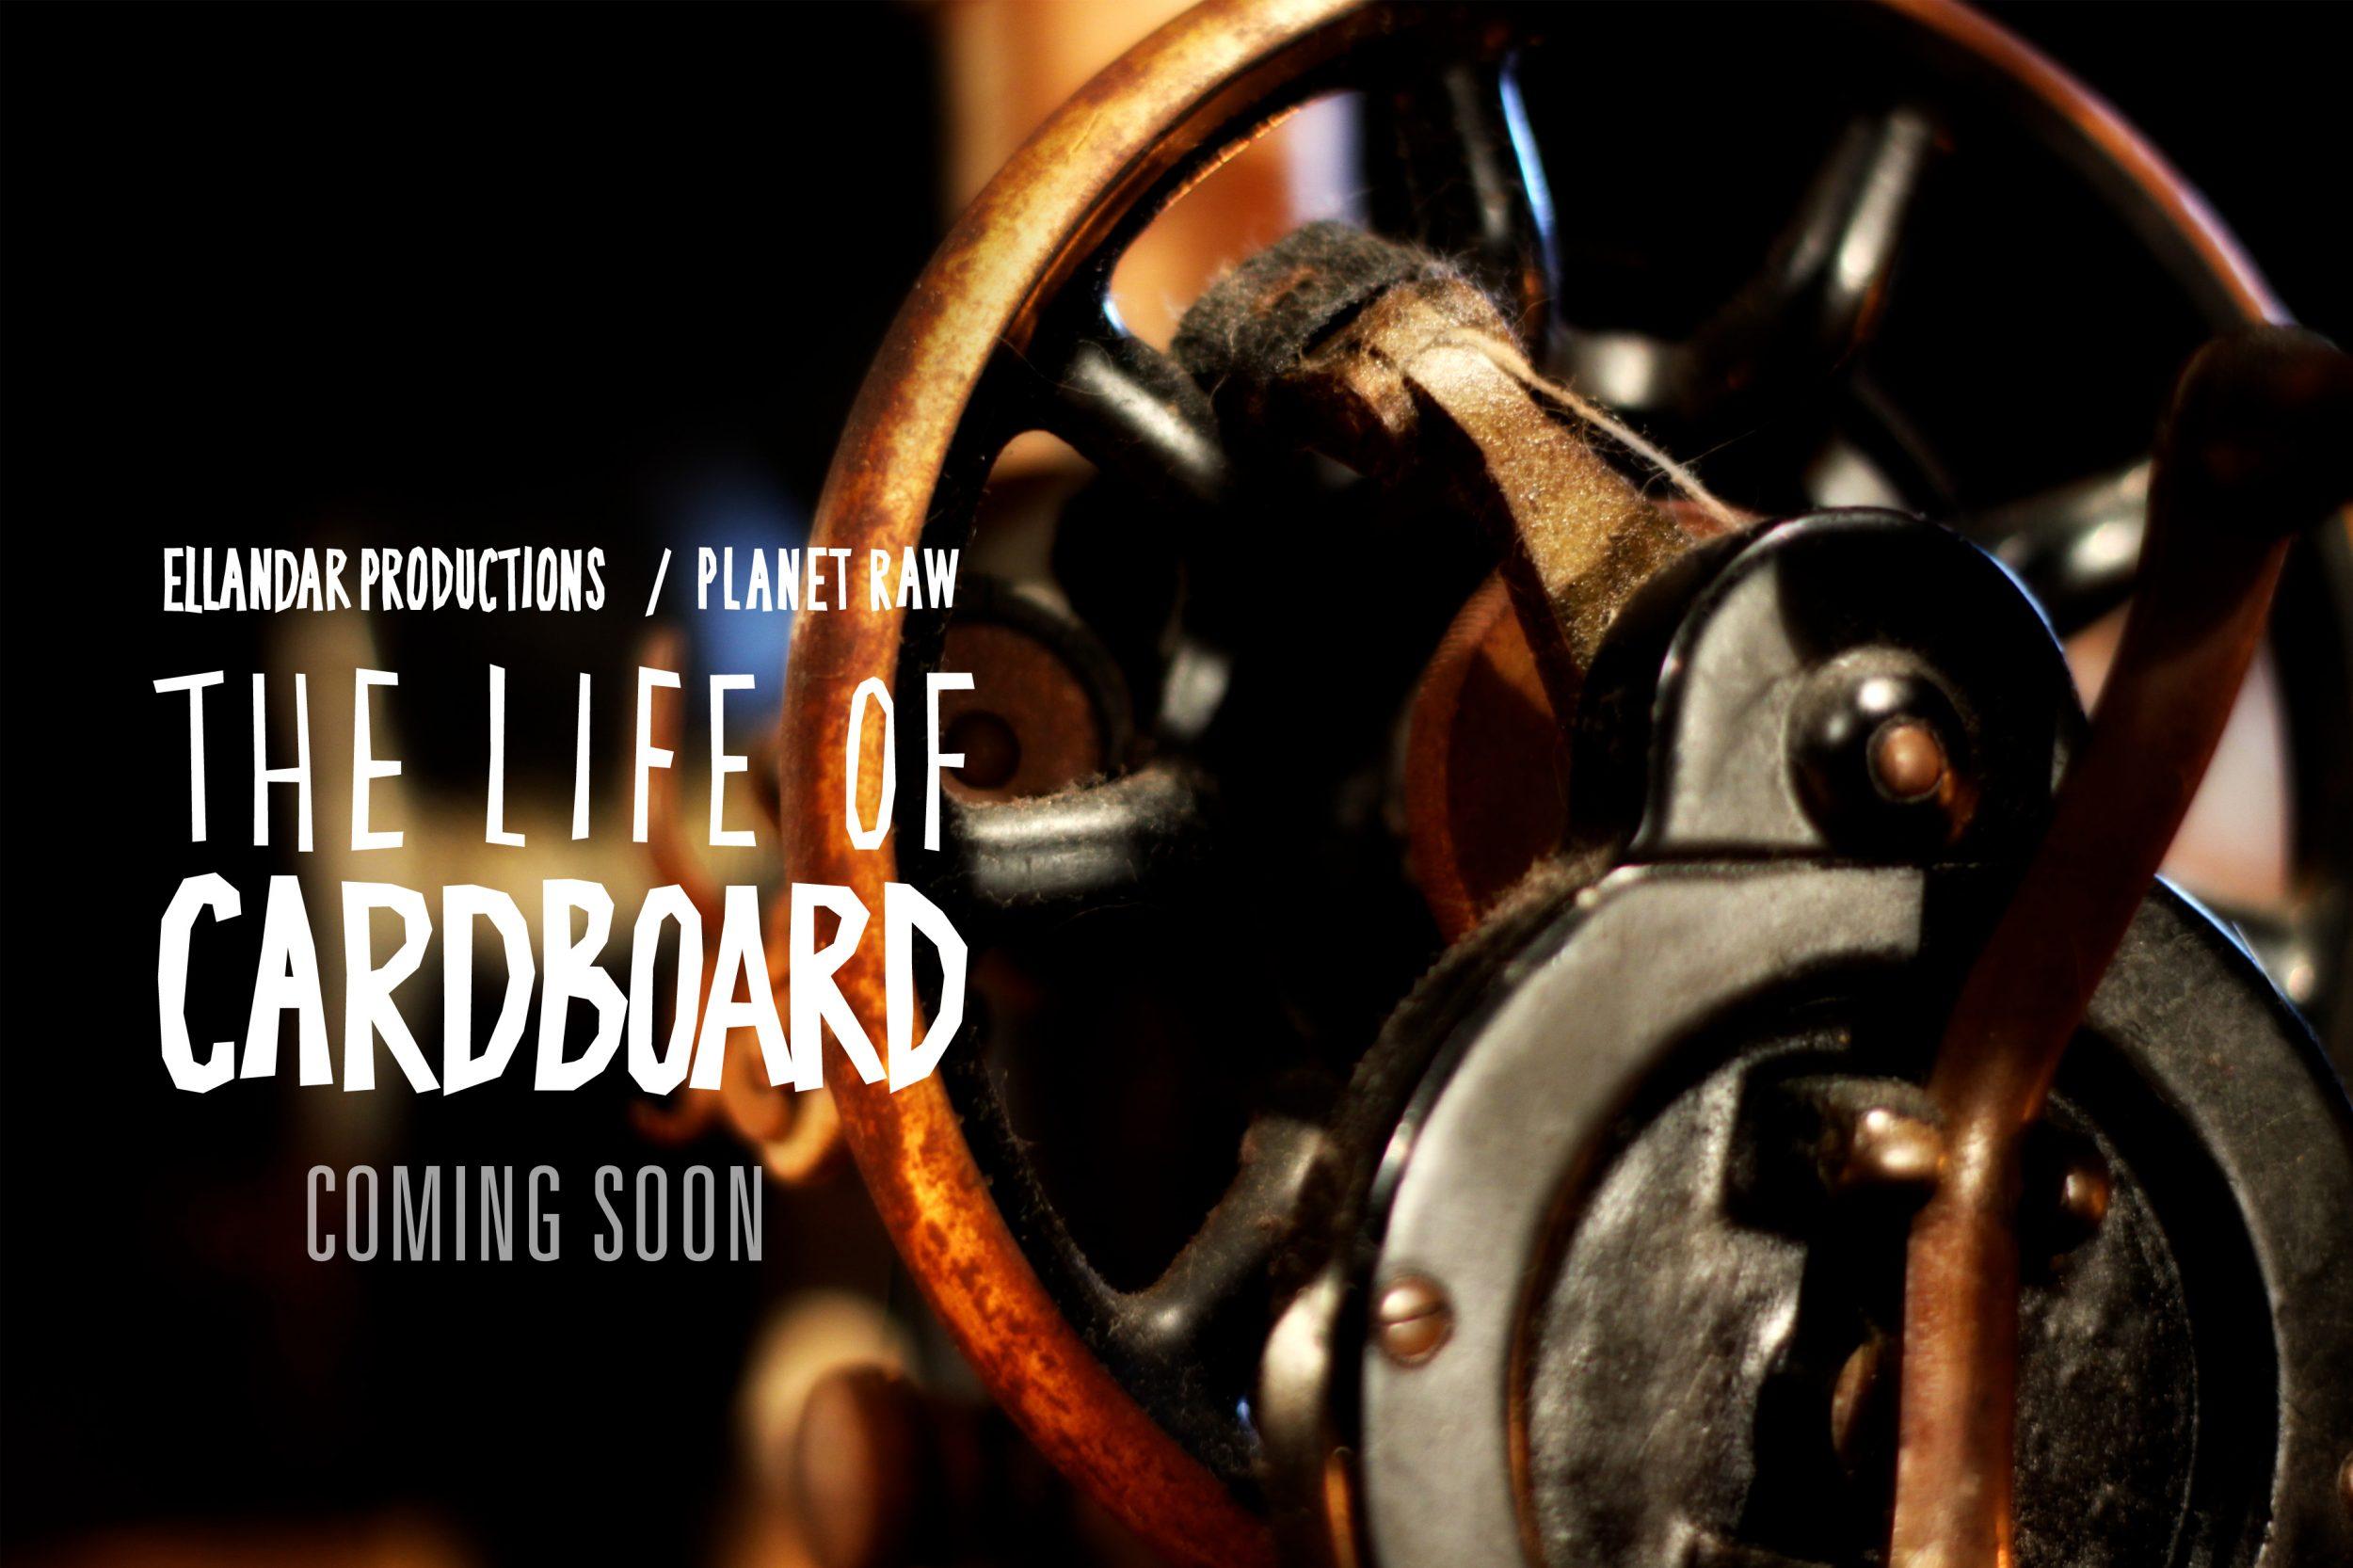 the-life-of-cardboard-1-1